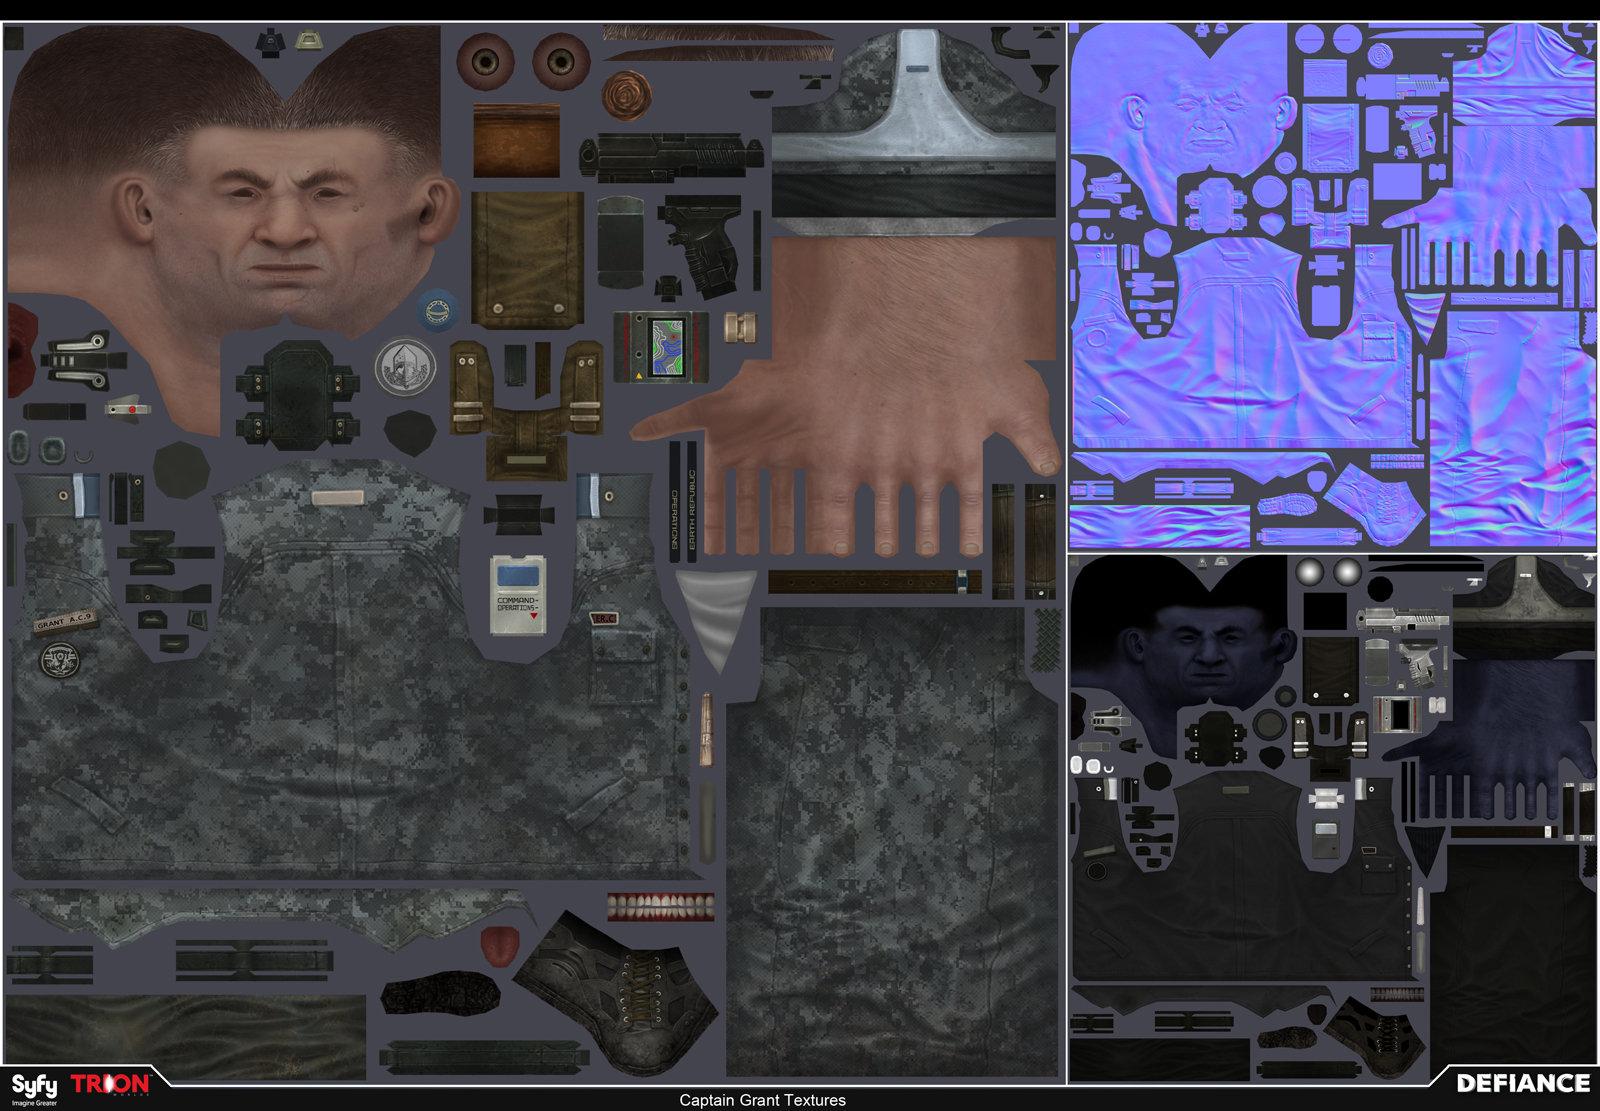 Star captain grant textures